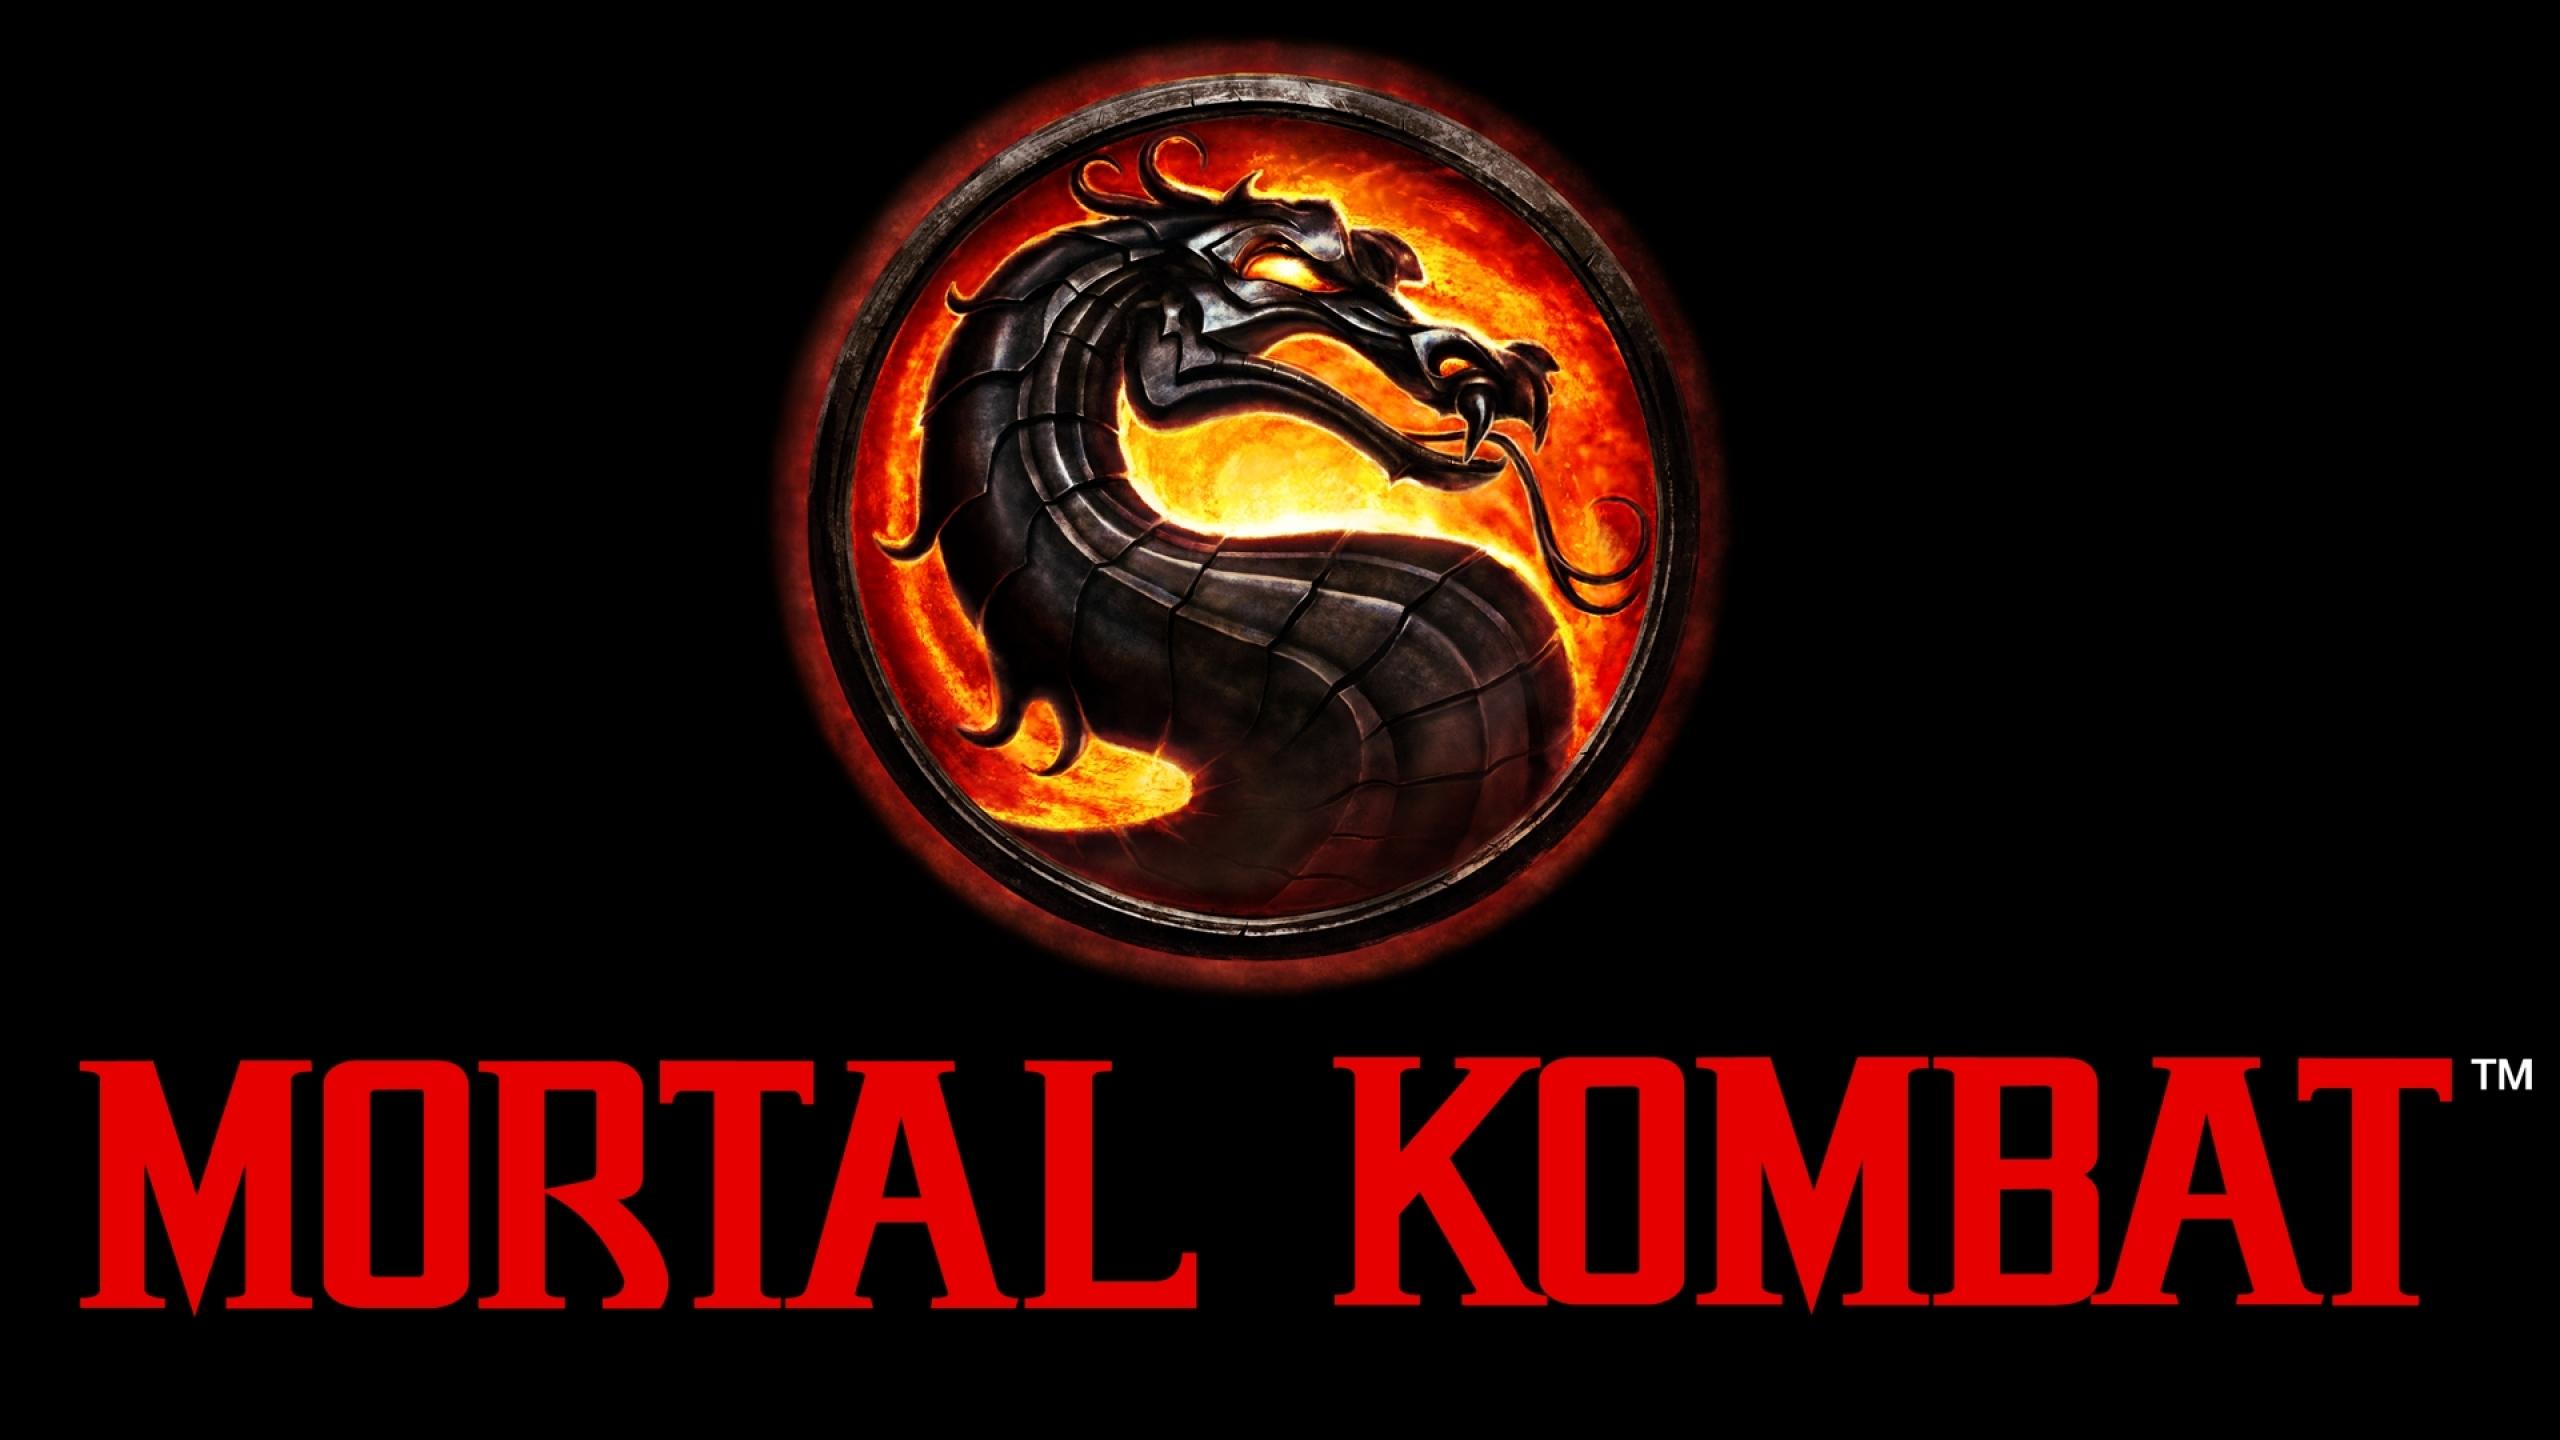 mortal kombat logo 1920x1080 wallpaper Wallpaper Wallpapers 2560x1440